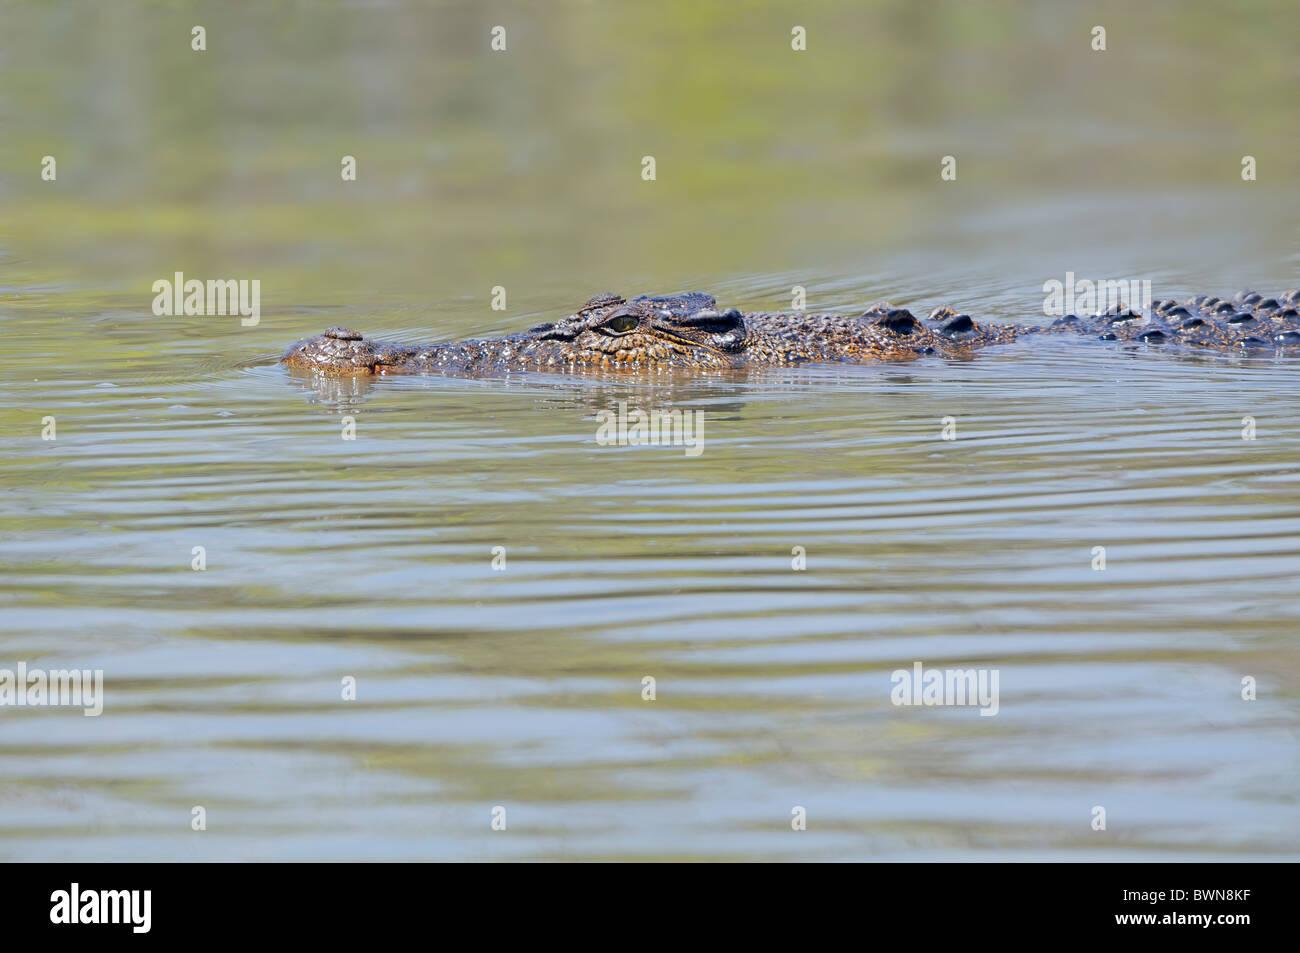 Crocodile swimming in the East Alligator River, Kakadu ,Top End, Northern Territory ,Australia - Stock Image